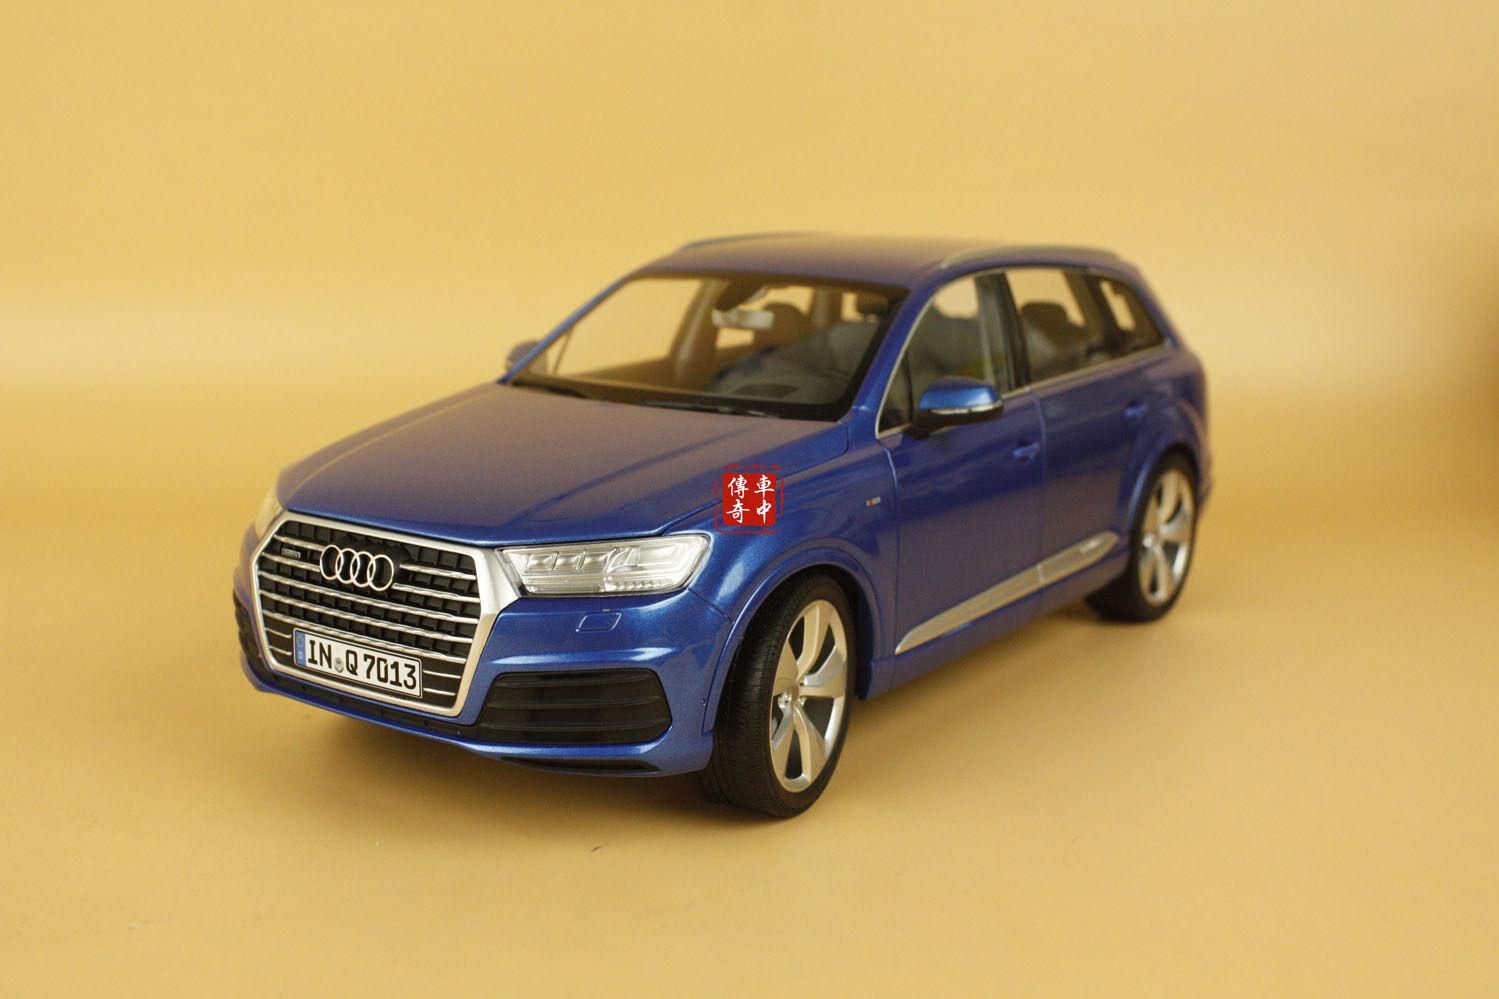 1 18 Almost Real Minichamps New Audi Q7 SUV 2015 blu Coloreee + gift